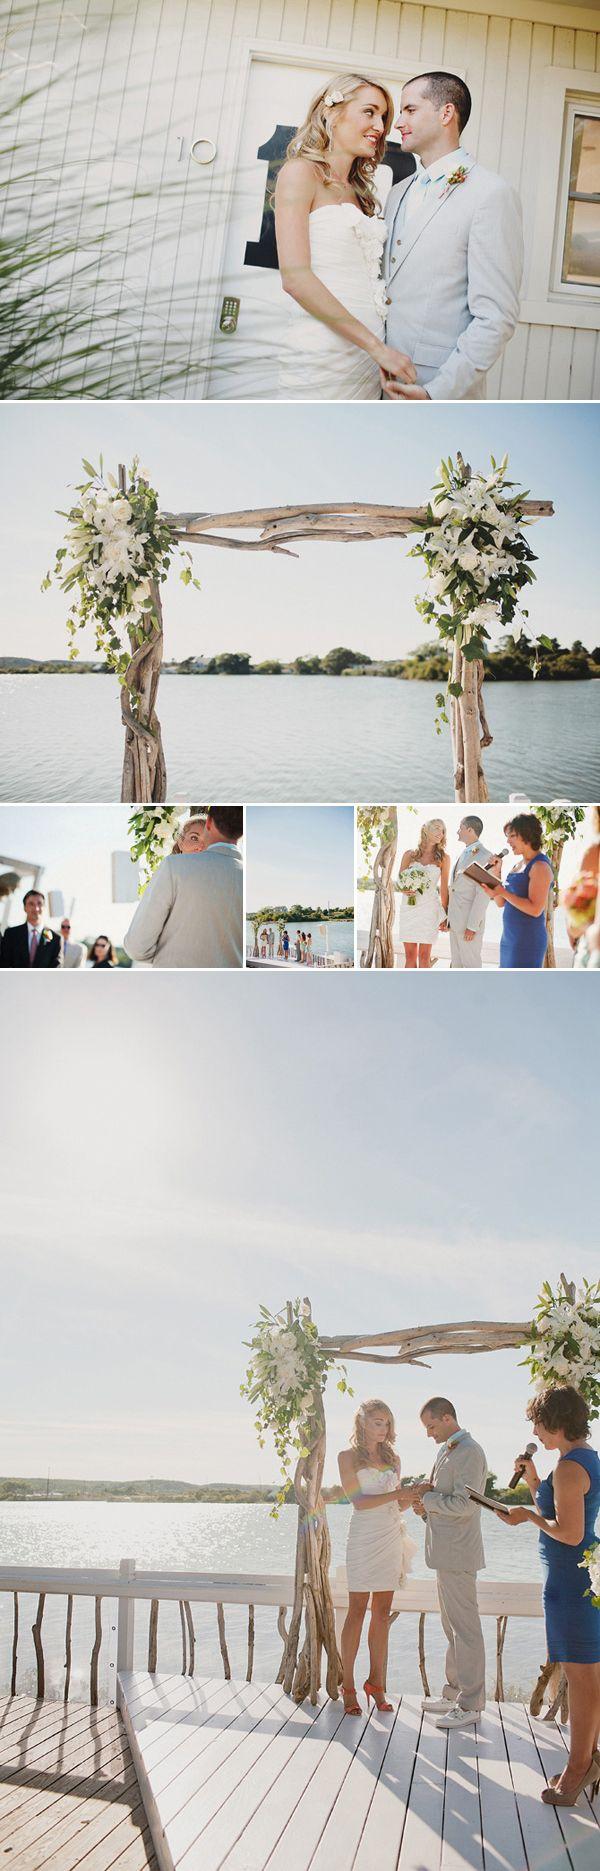 destination wedding photographer AGAiMAGES